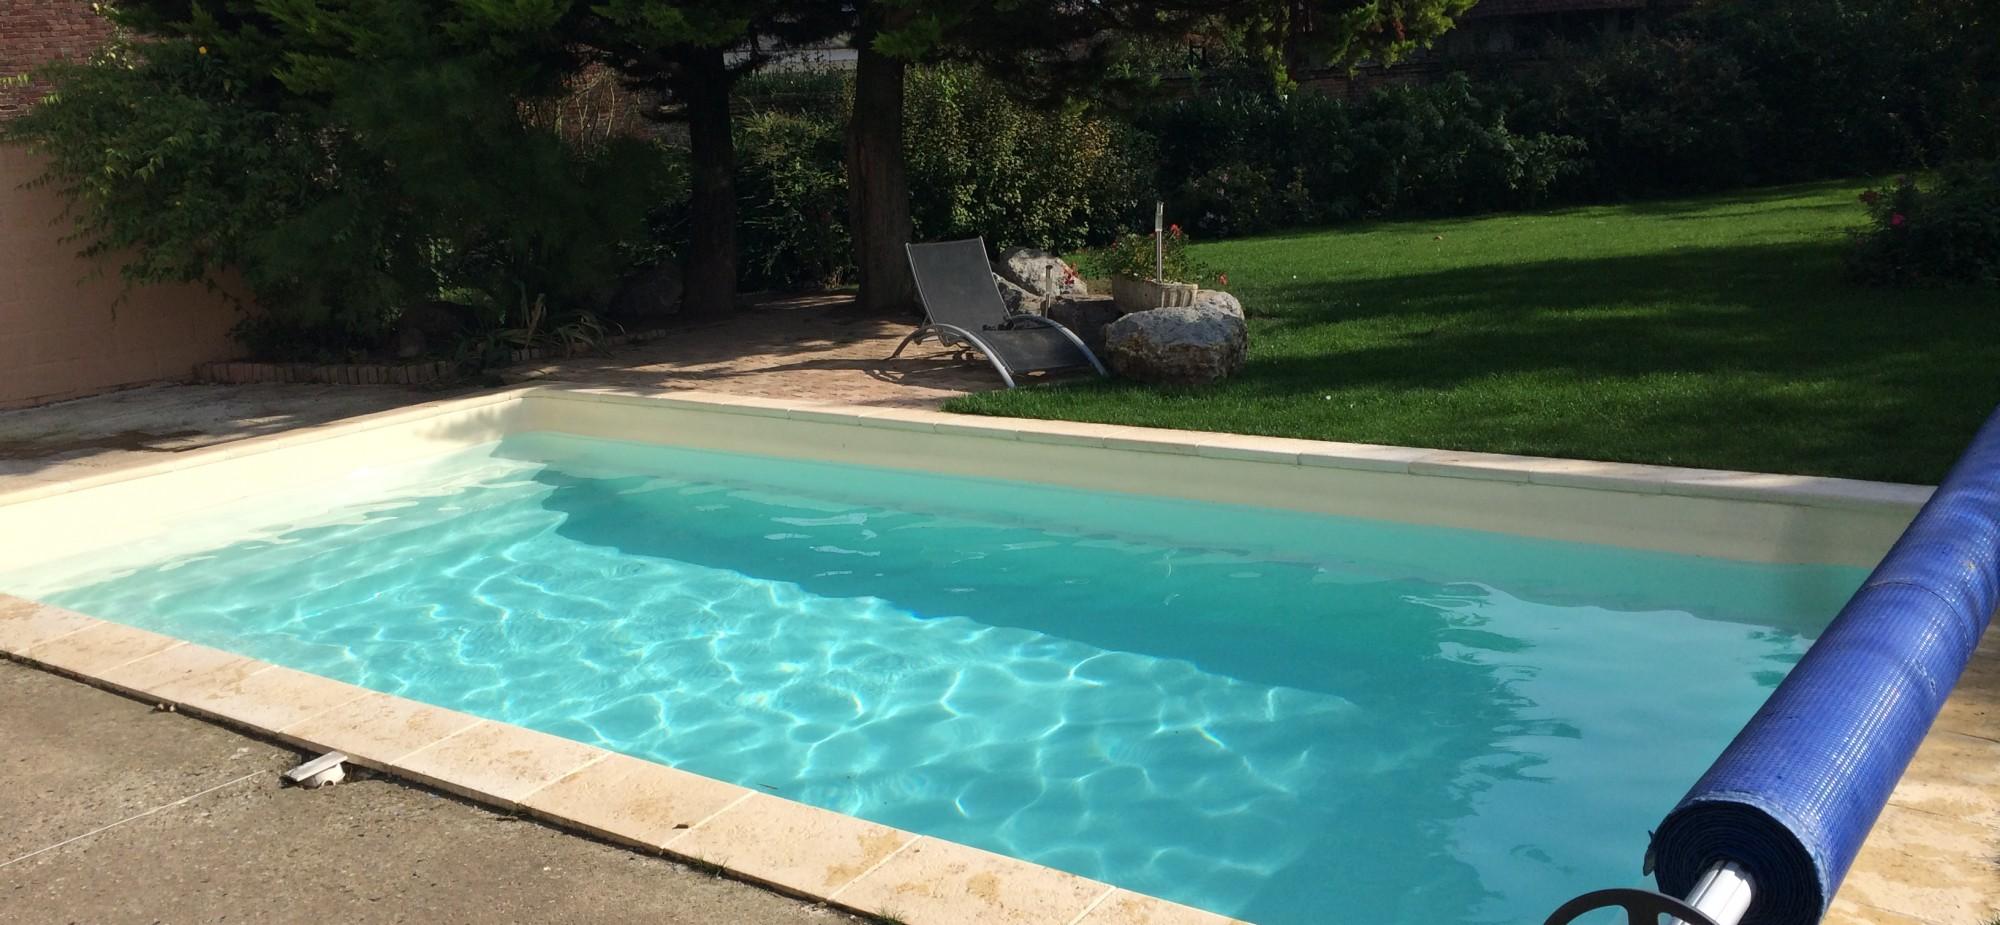 Installation et vente de piscine de spas et de saunas for Piscine 02 peronne